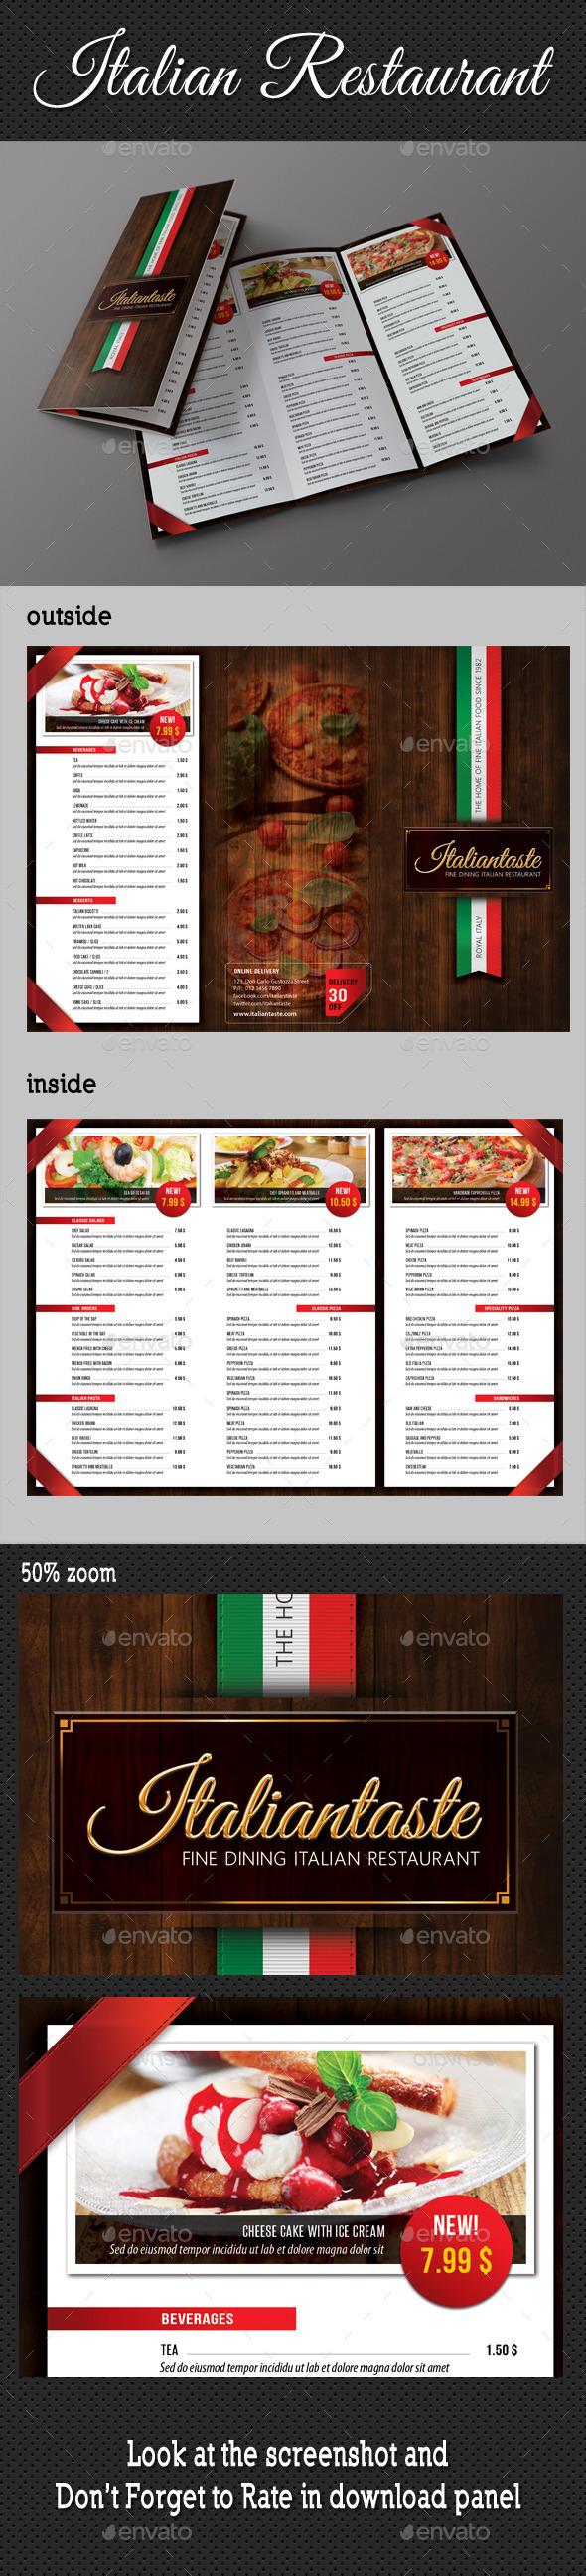 Italian Restaurant 3-Fold Brochure - Brochures Print Templates